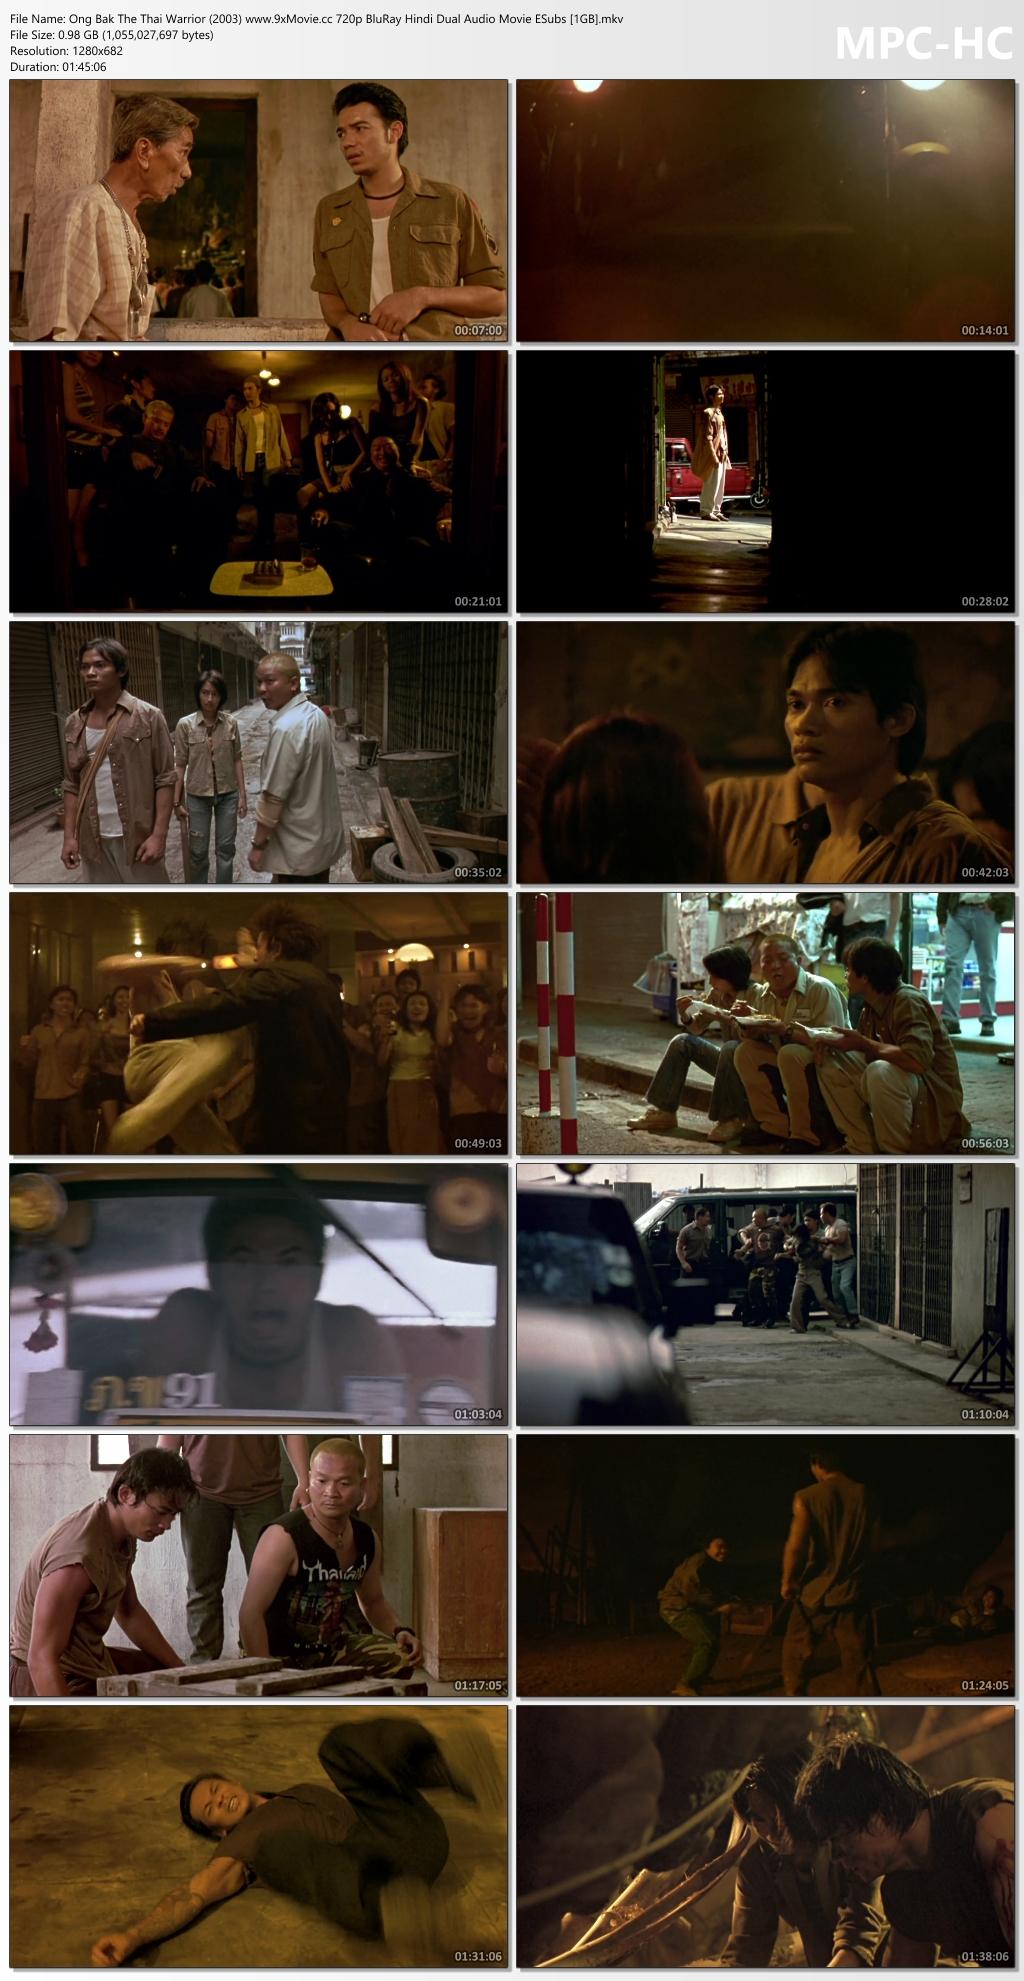 Ong-Bak-The-Thai-Warrior-2003-www-9x-Movie-cc-720p-Blu-Ray-Hindi-Dual-Audio-Movie-ESubs-1-GB-mkv